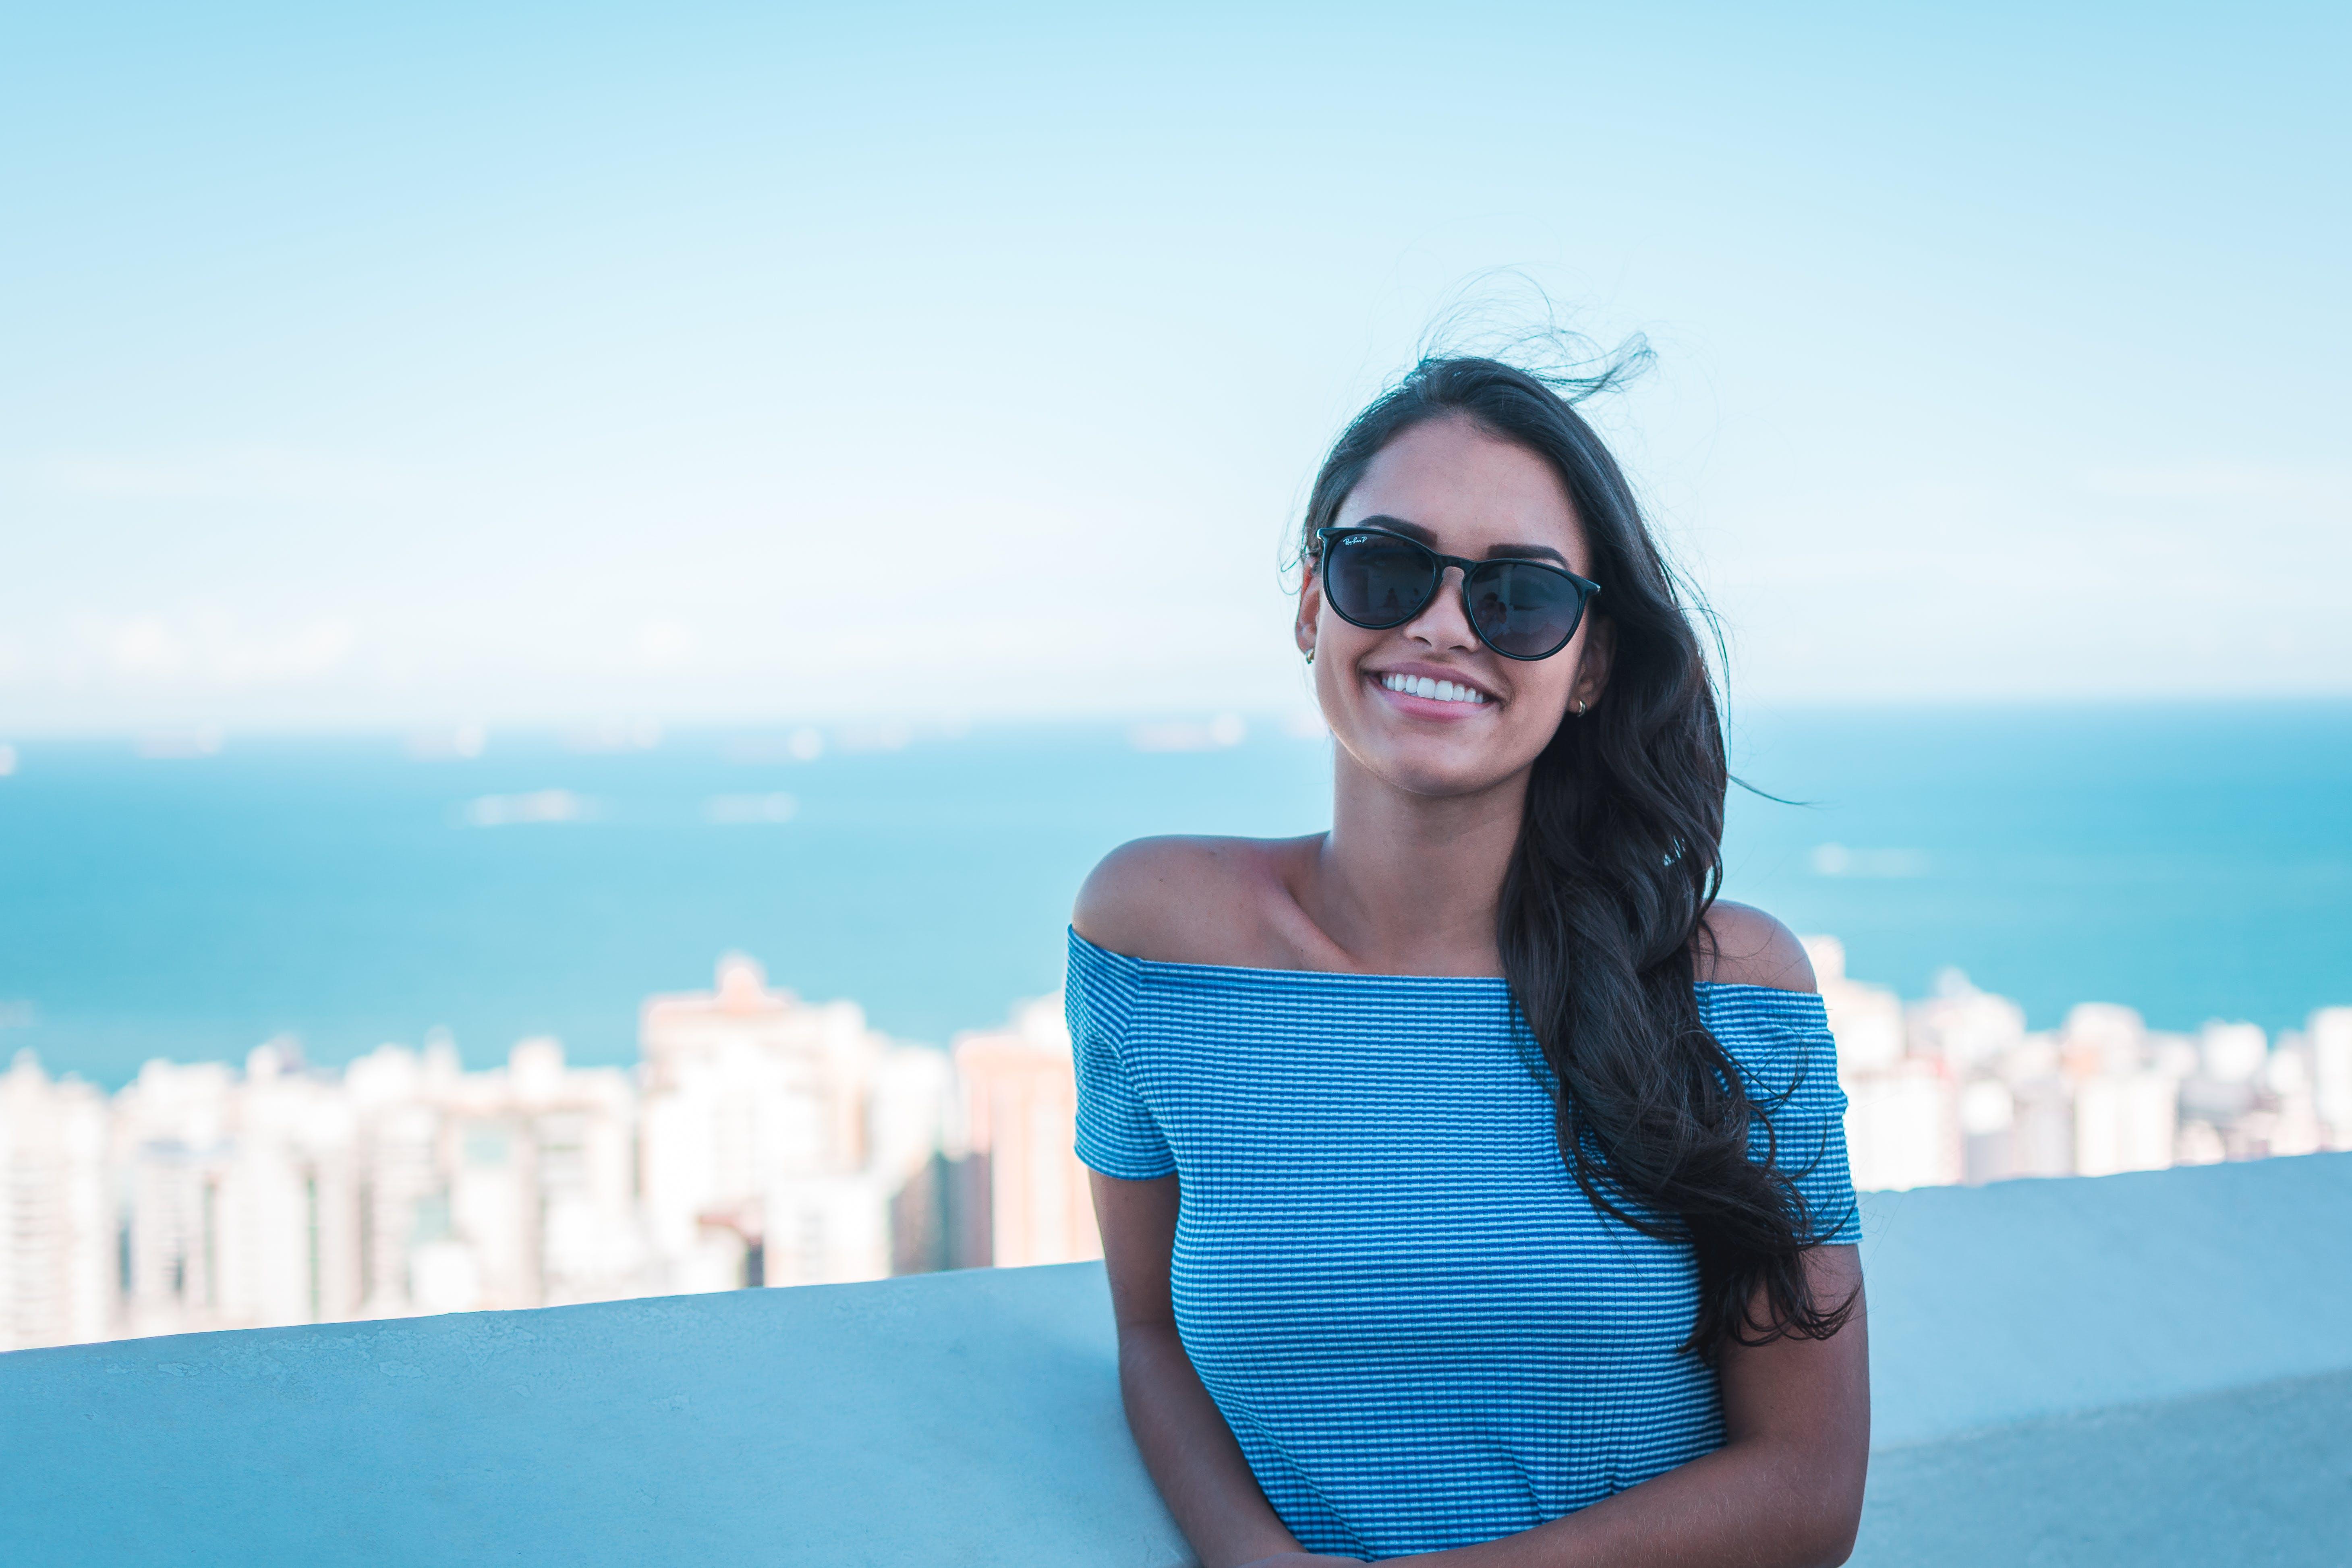 Woman Wearing Blue Off-shoulder Top Smiling